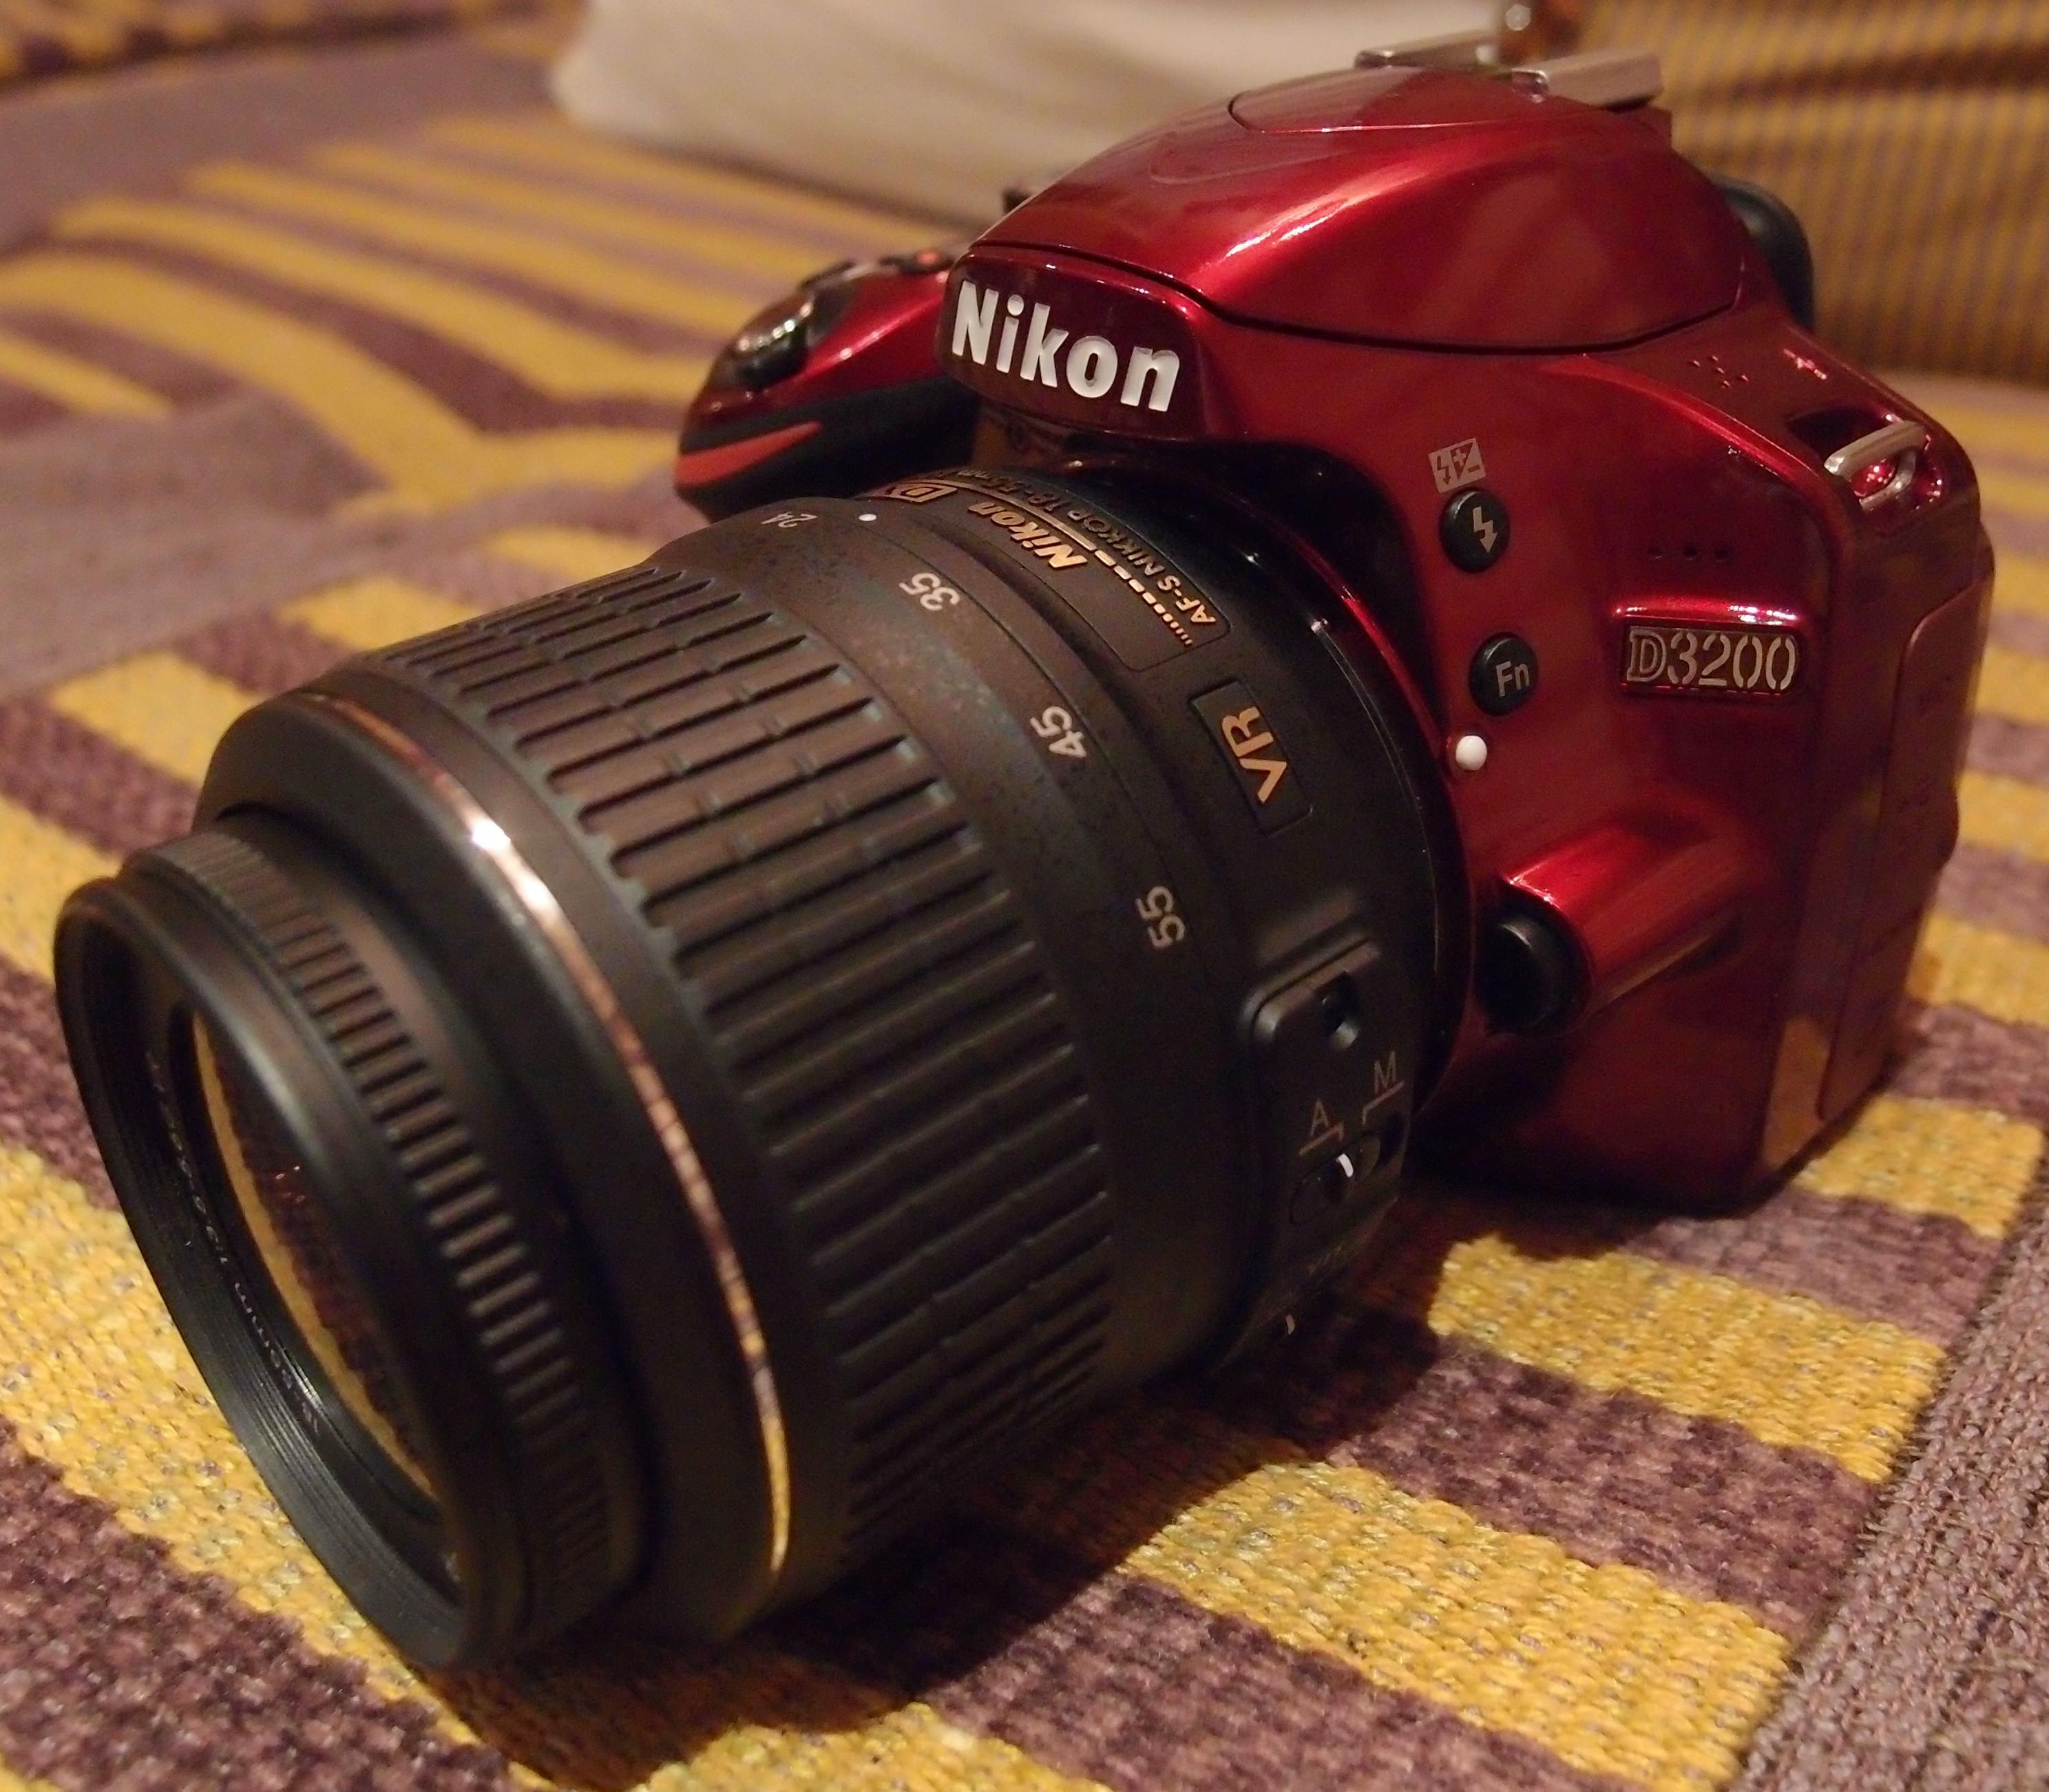 Camera Reviews On Nikon D3200 Dslr Camera nikon d3200 digital slr hands on preview features